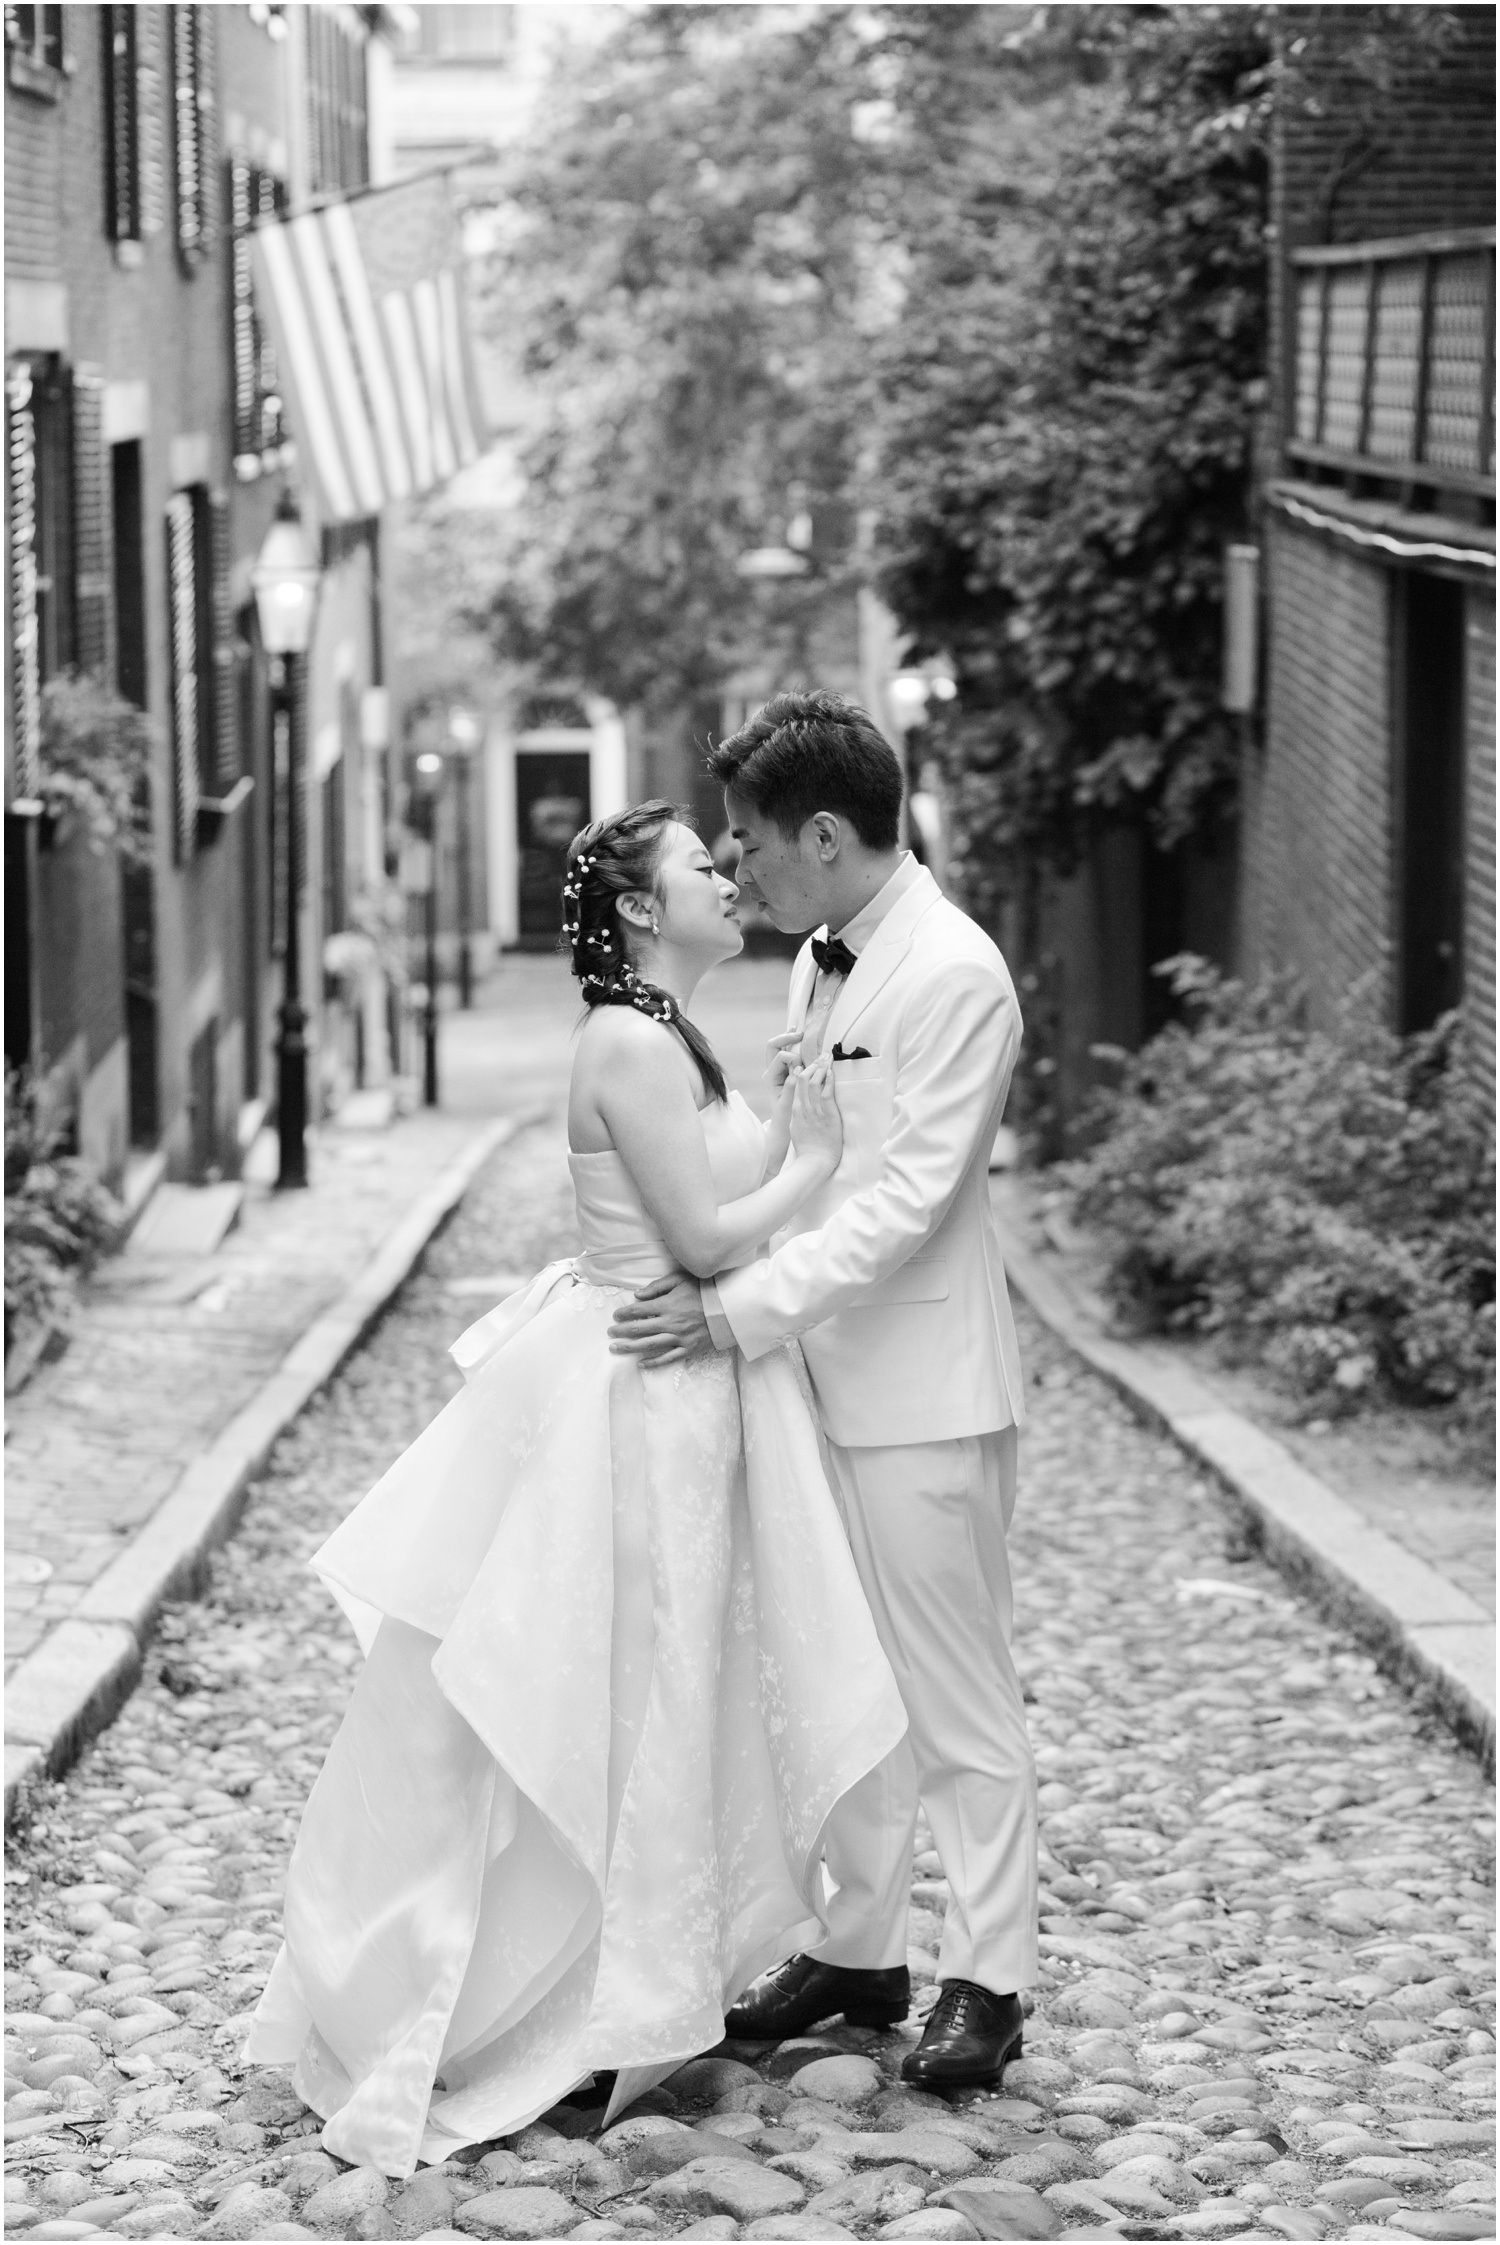 Acorn Street Engagement Session // Boston Engagement Photographer